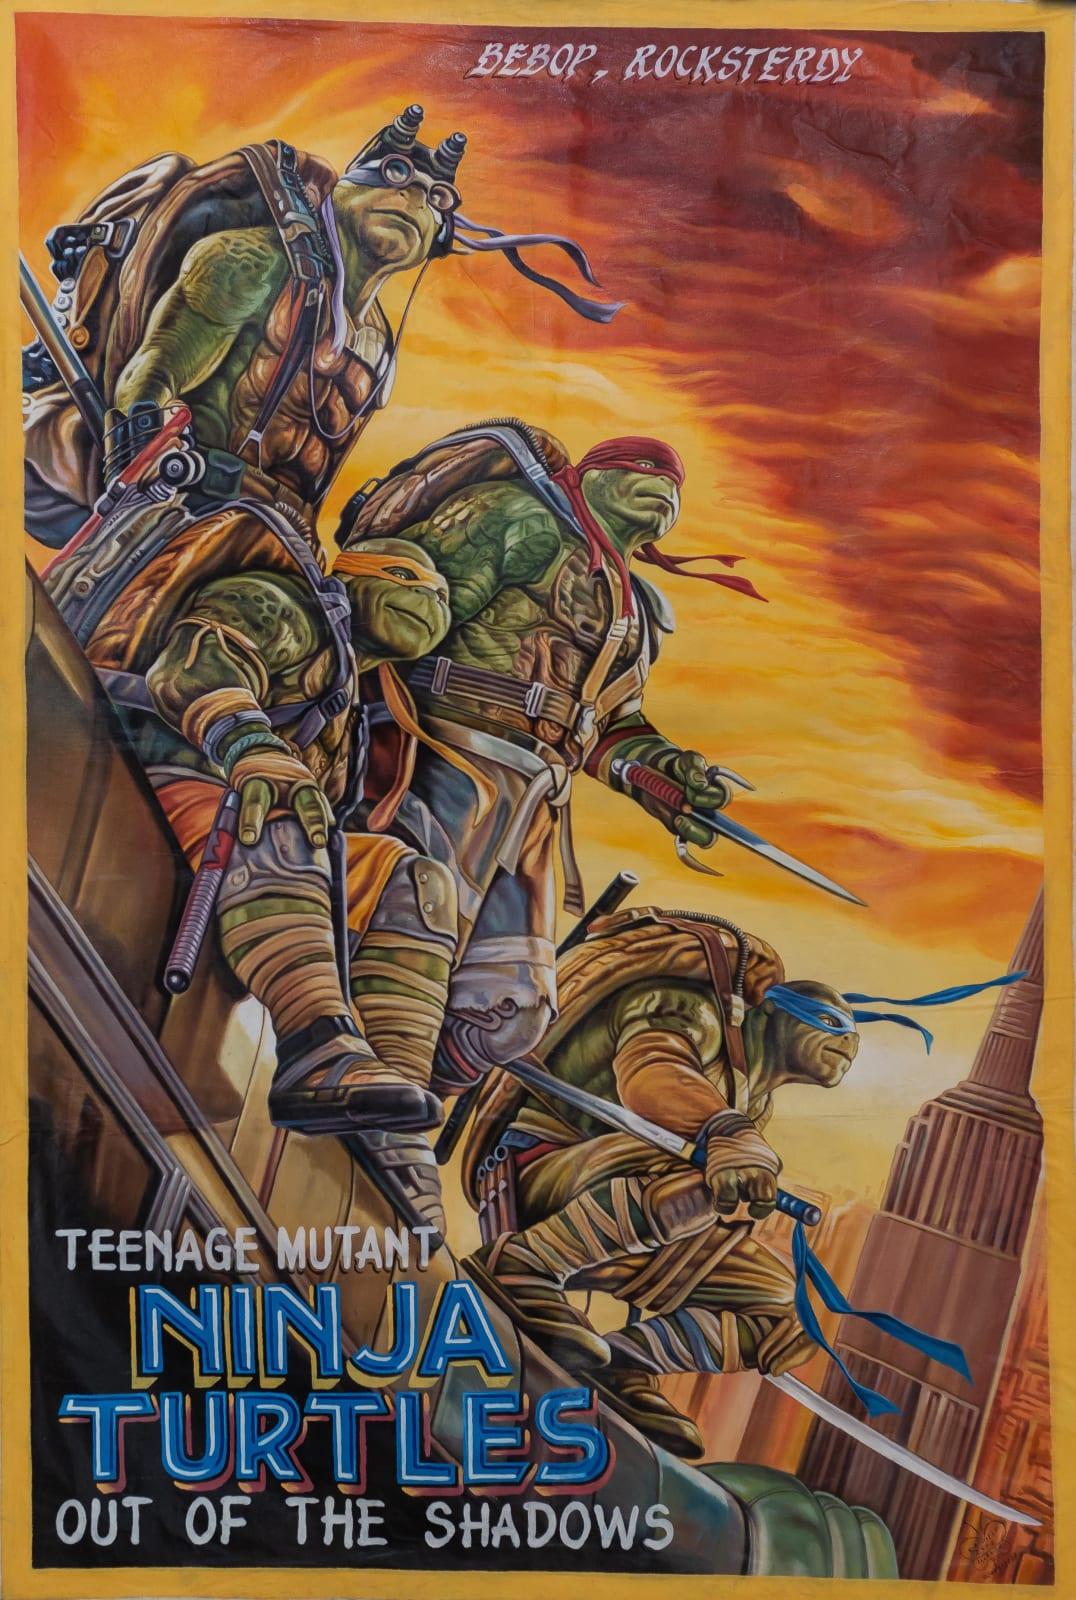 Teenage Mutant Ninja Turtles Out of the Shadows 151 x 101 cm